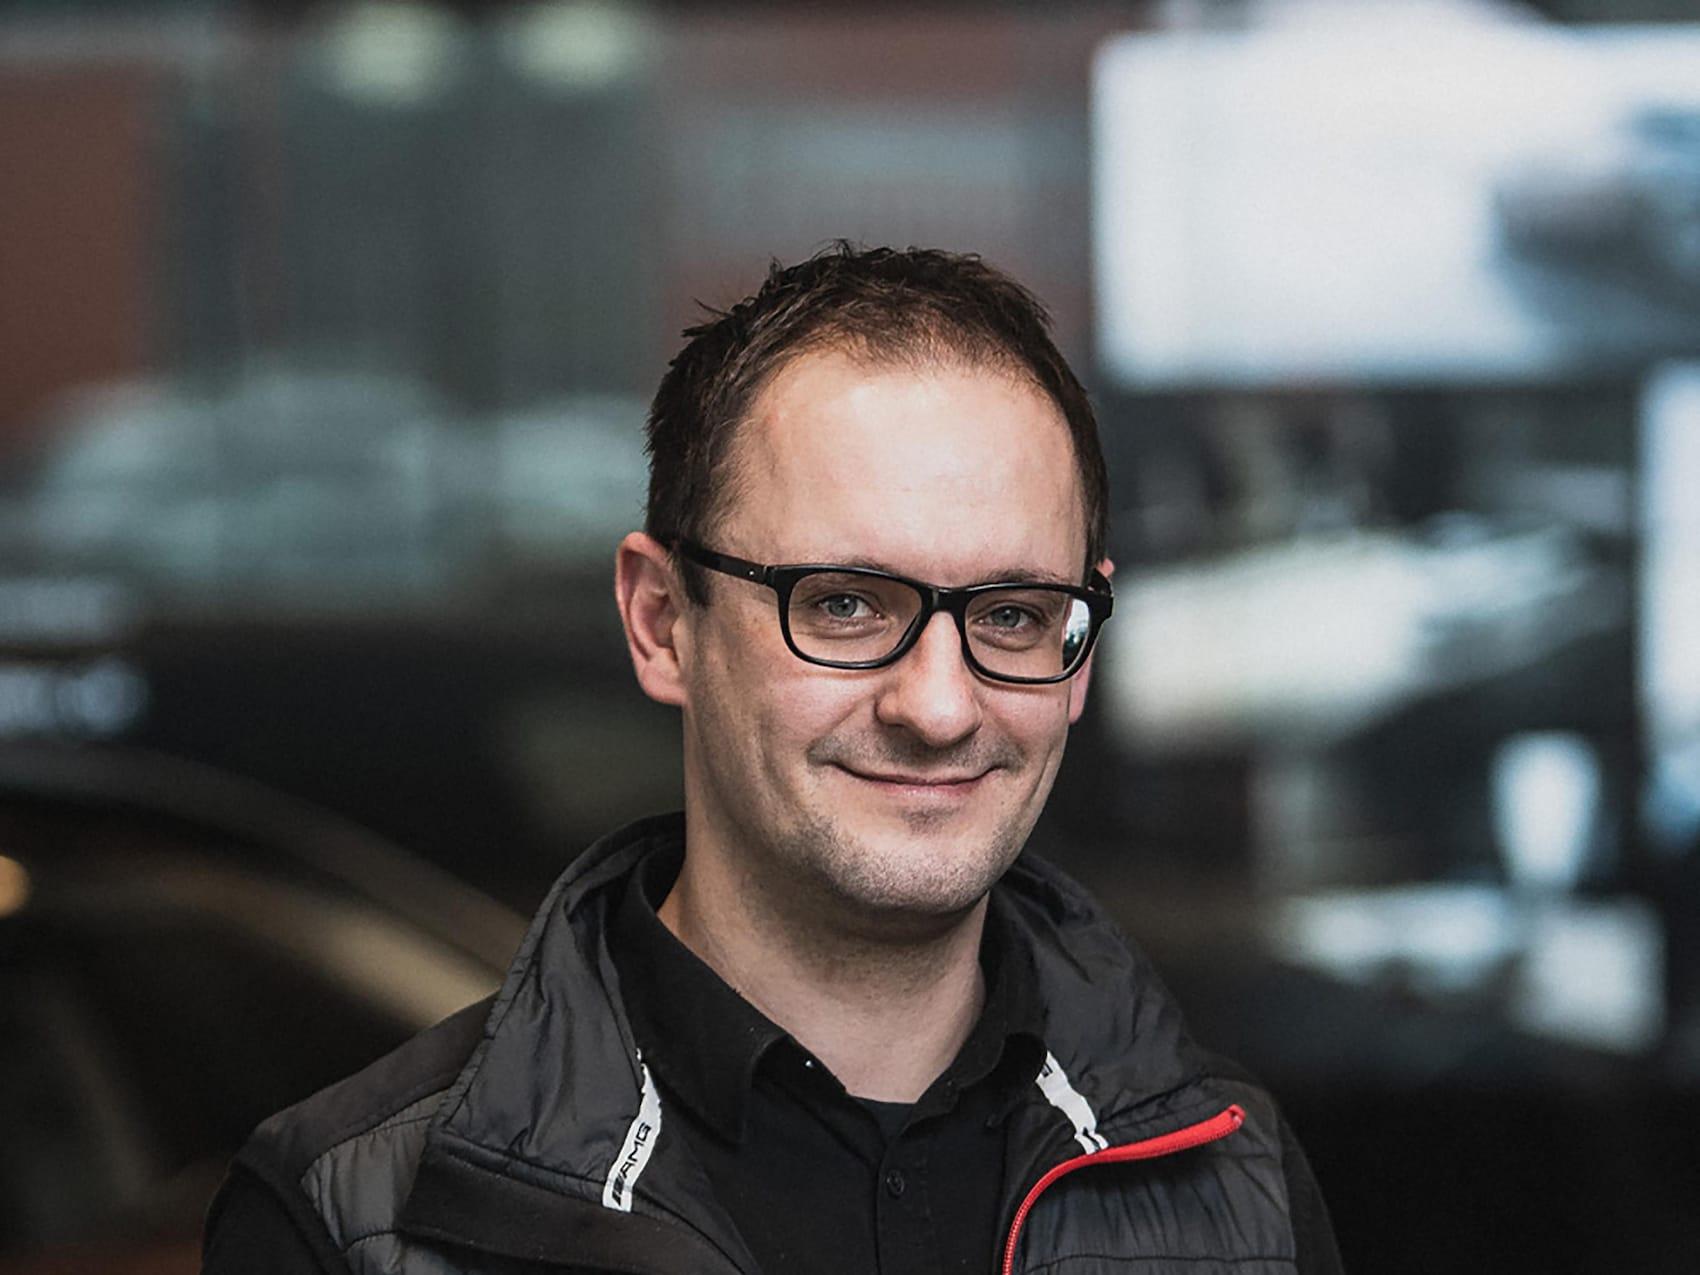 team-sc-Allgäu-Milantzkis-Andres